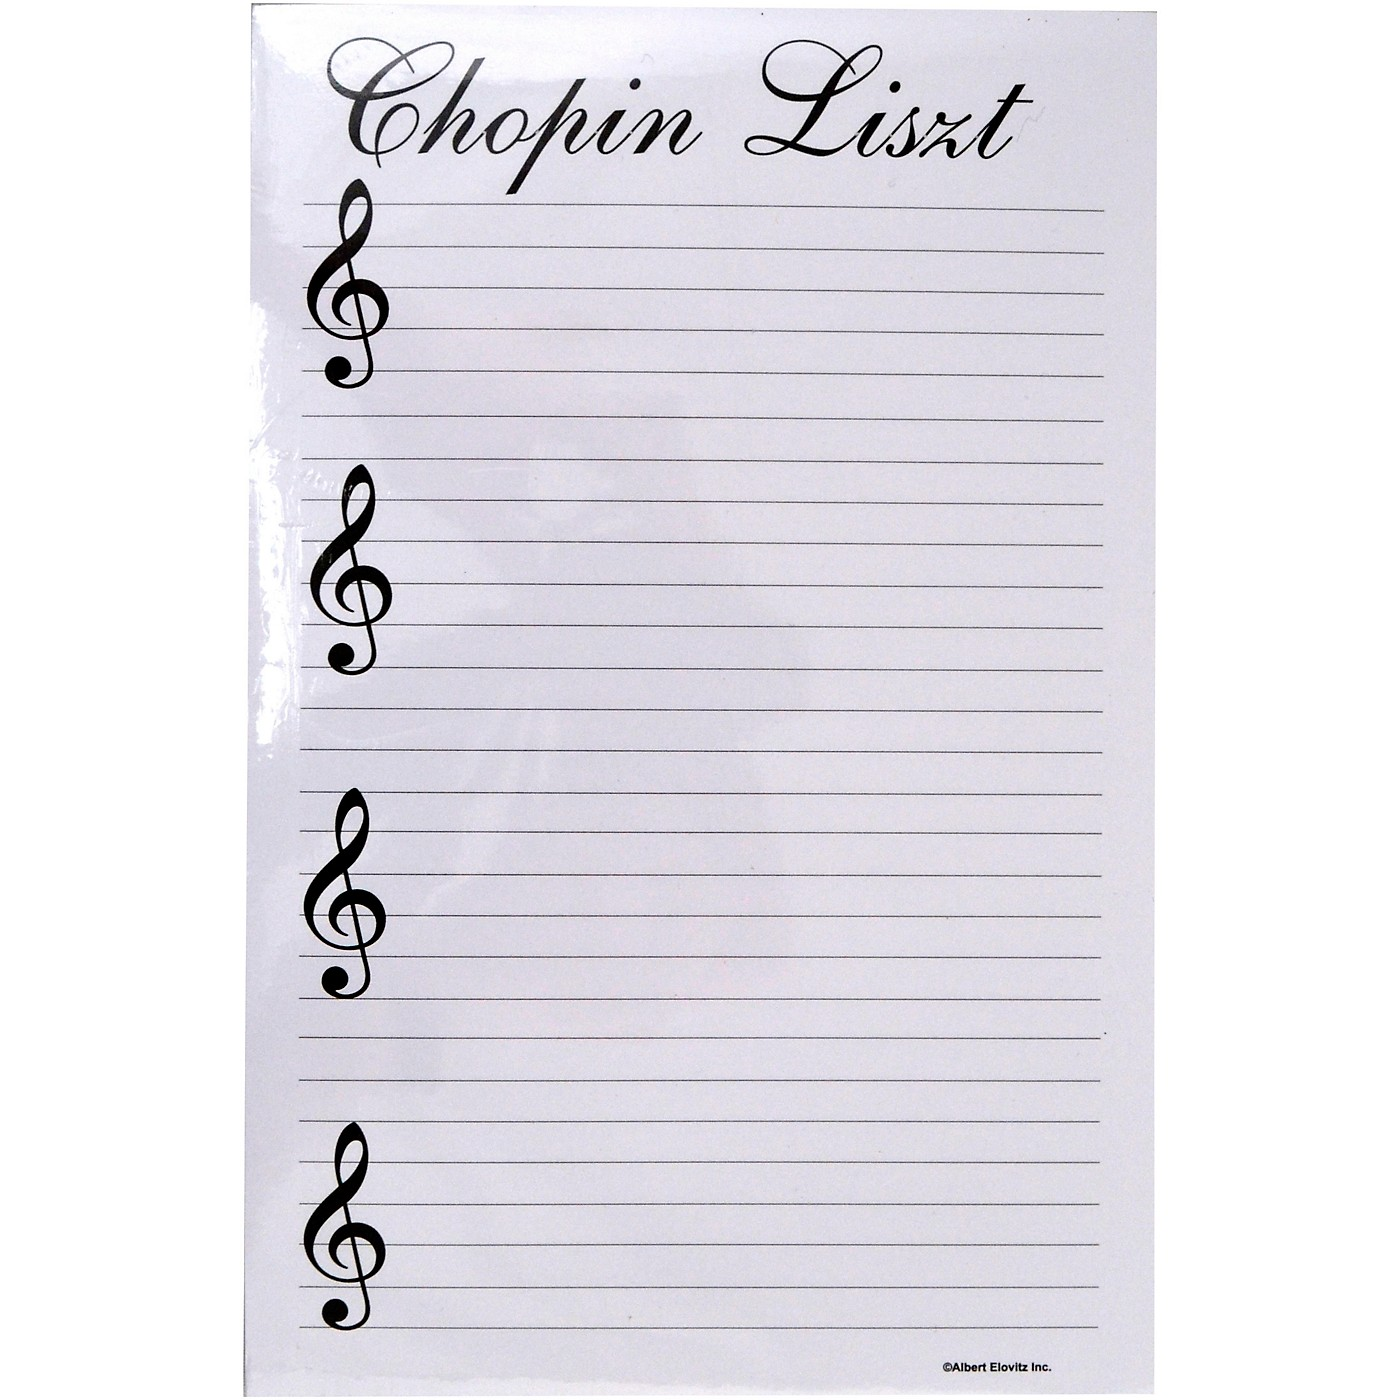 AIM Chopin Liszt Notepad thumbnail